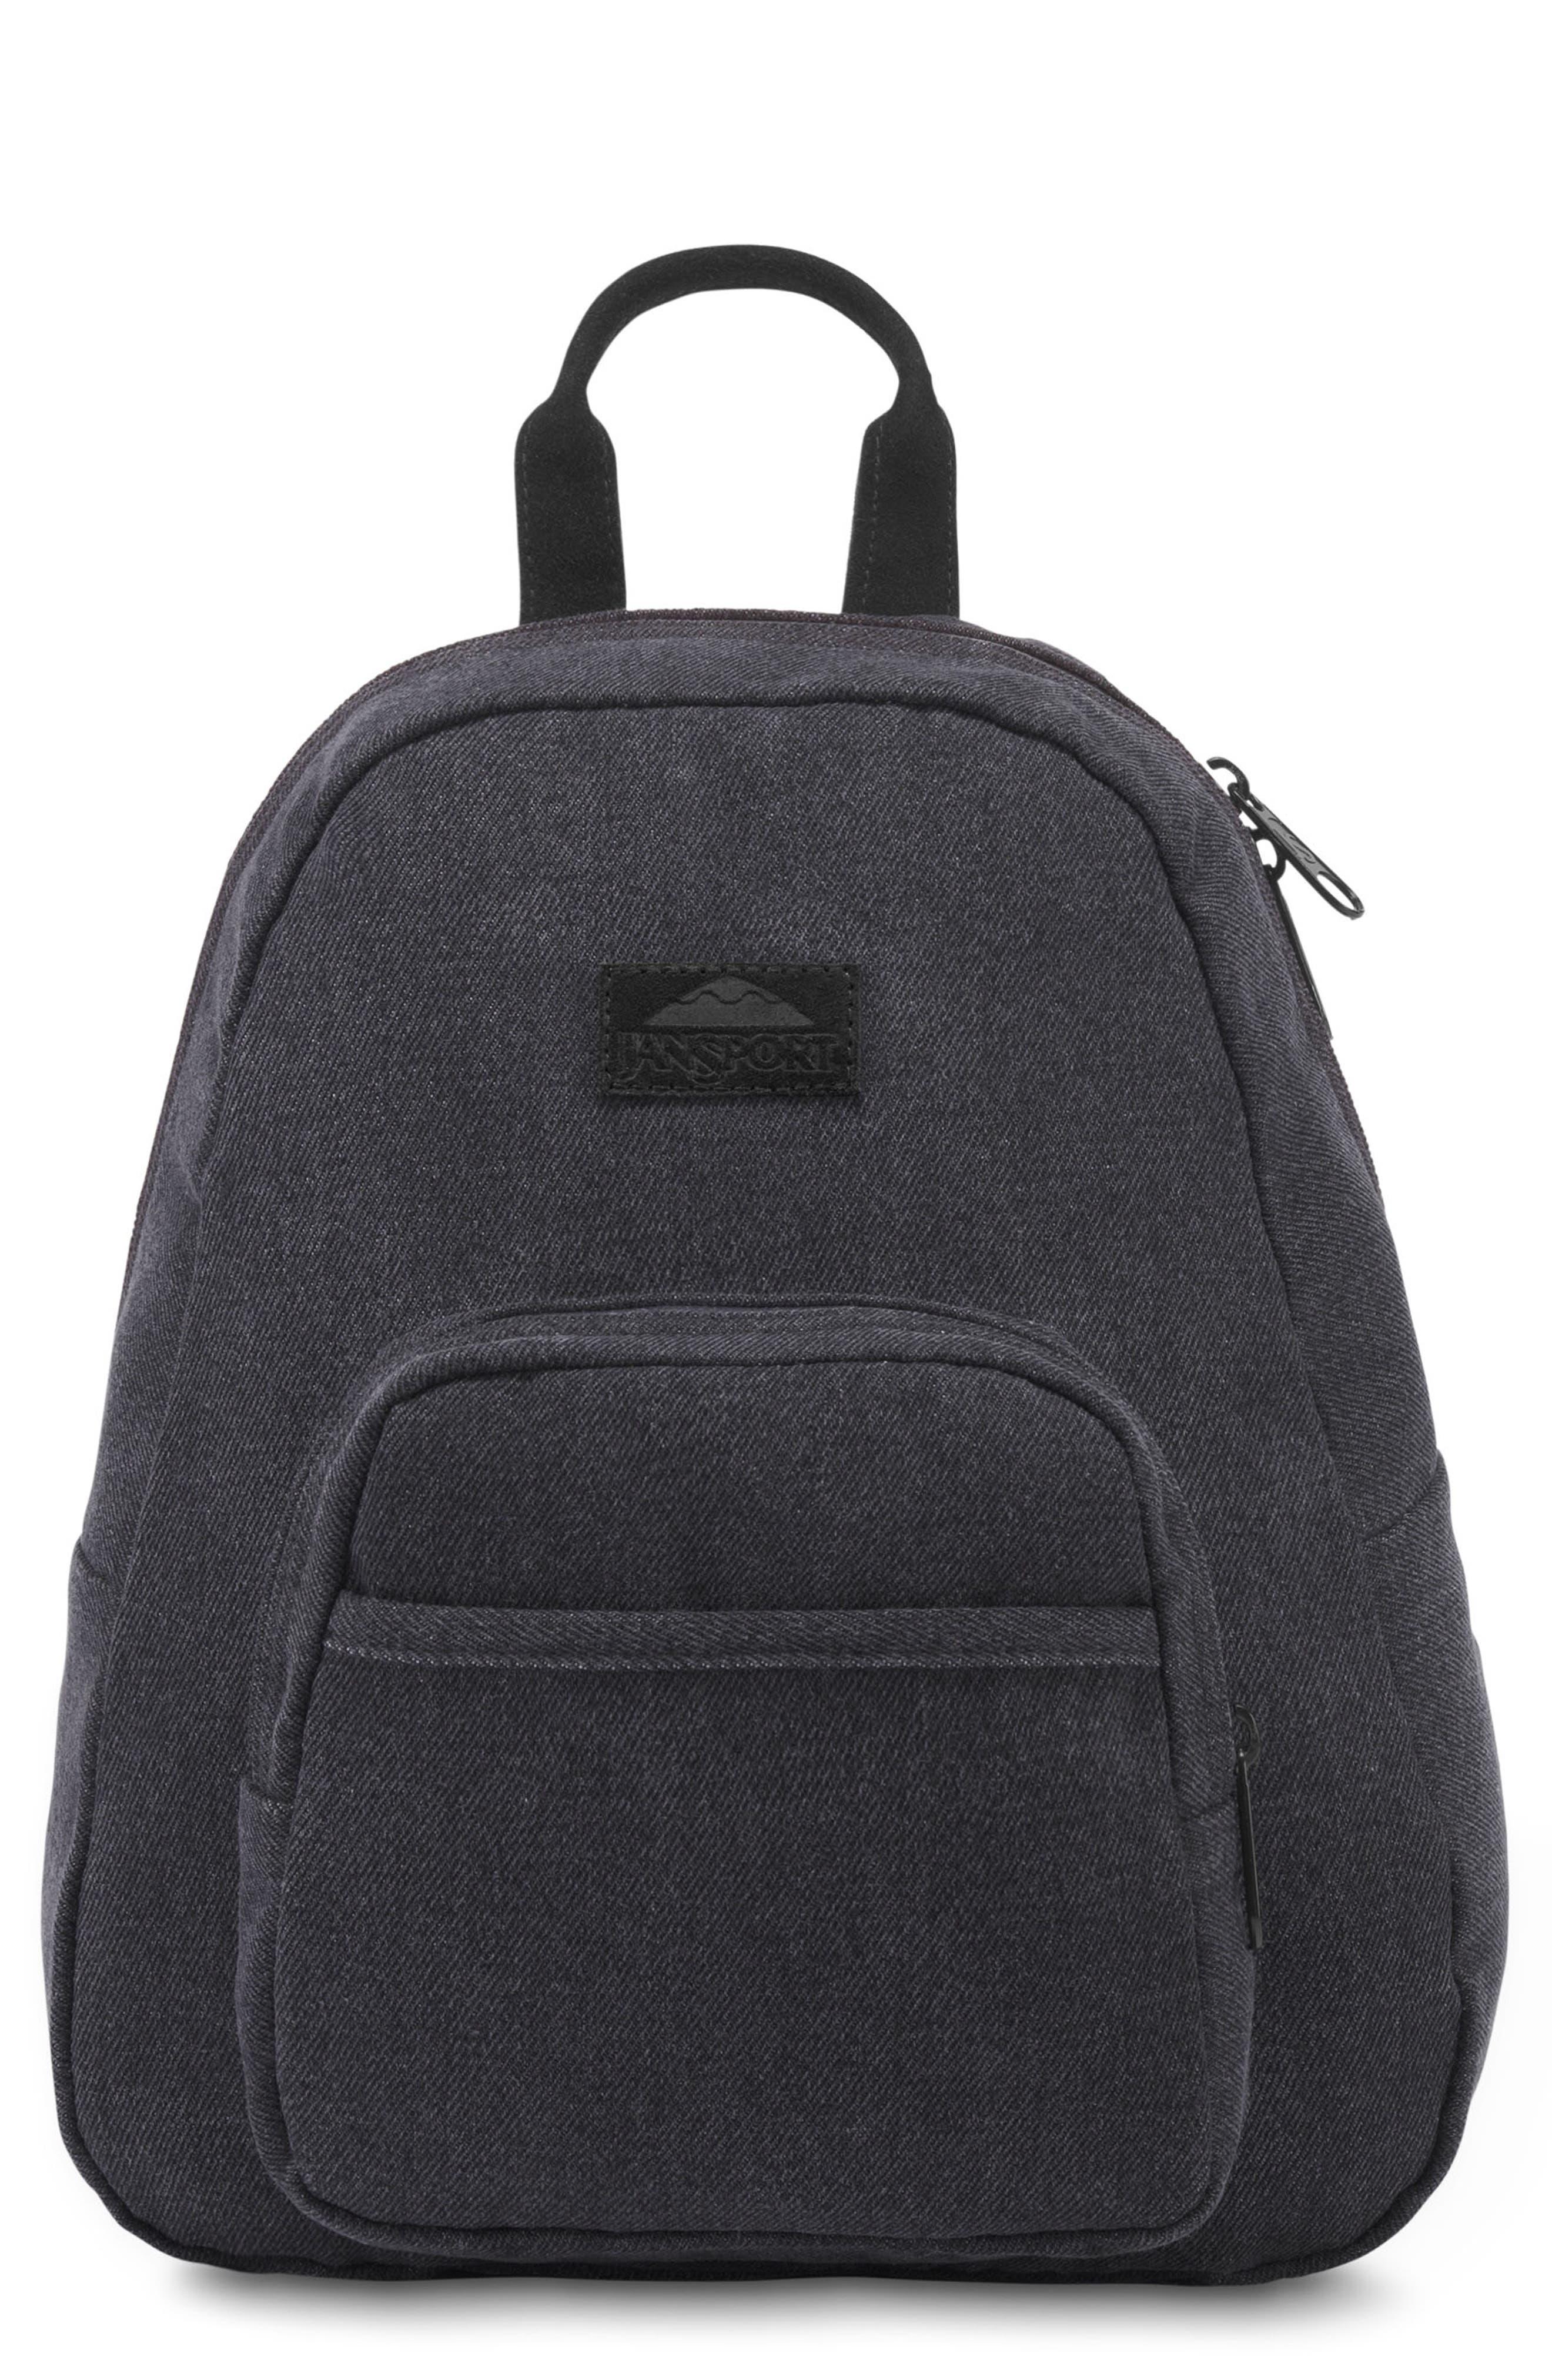 Half Pint Mini Backpack, Main, color, 002